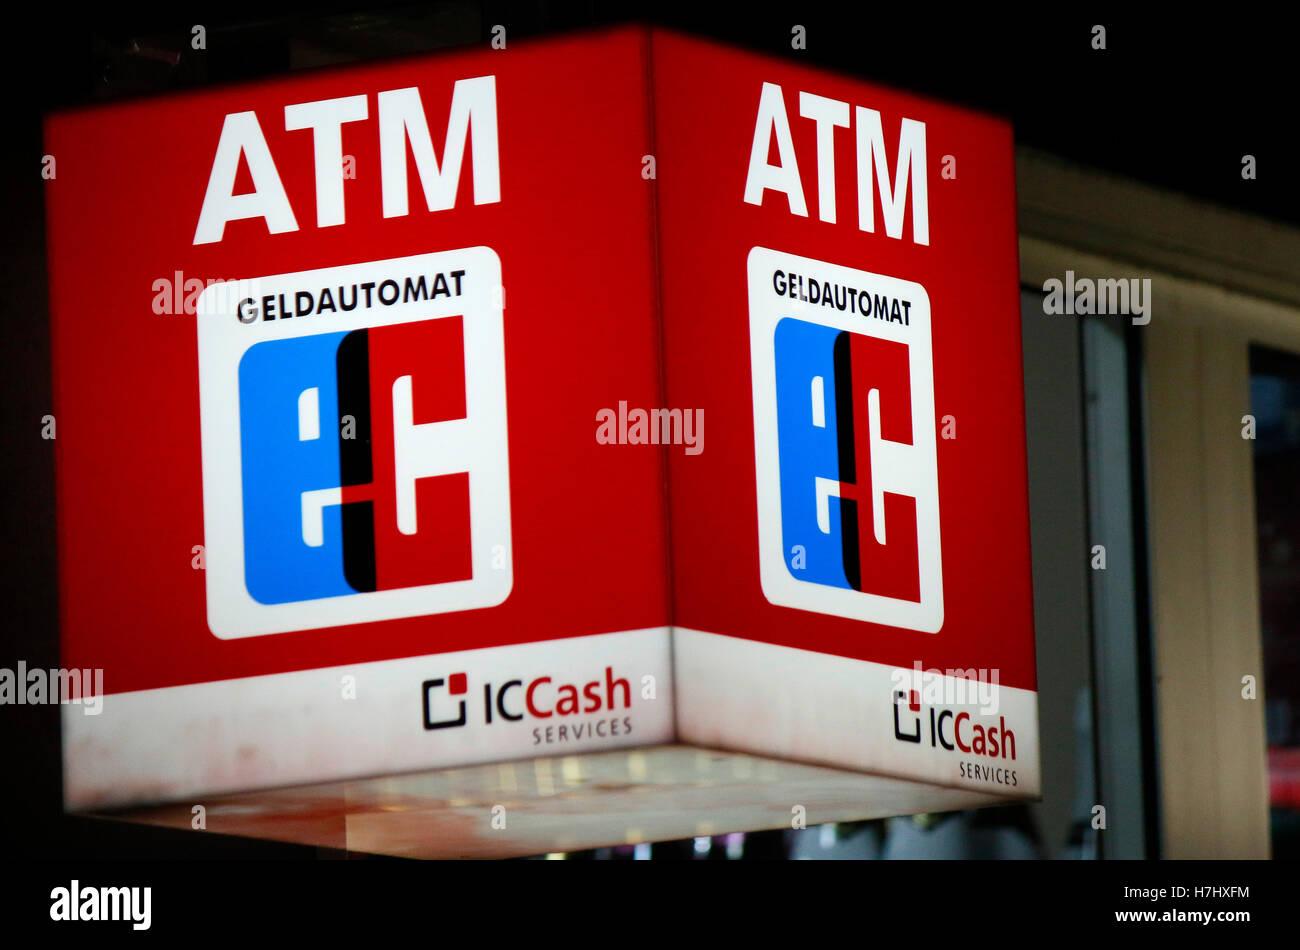 das Logo der Marke 'ATM EC', Berlin. - Stock Image